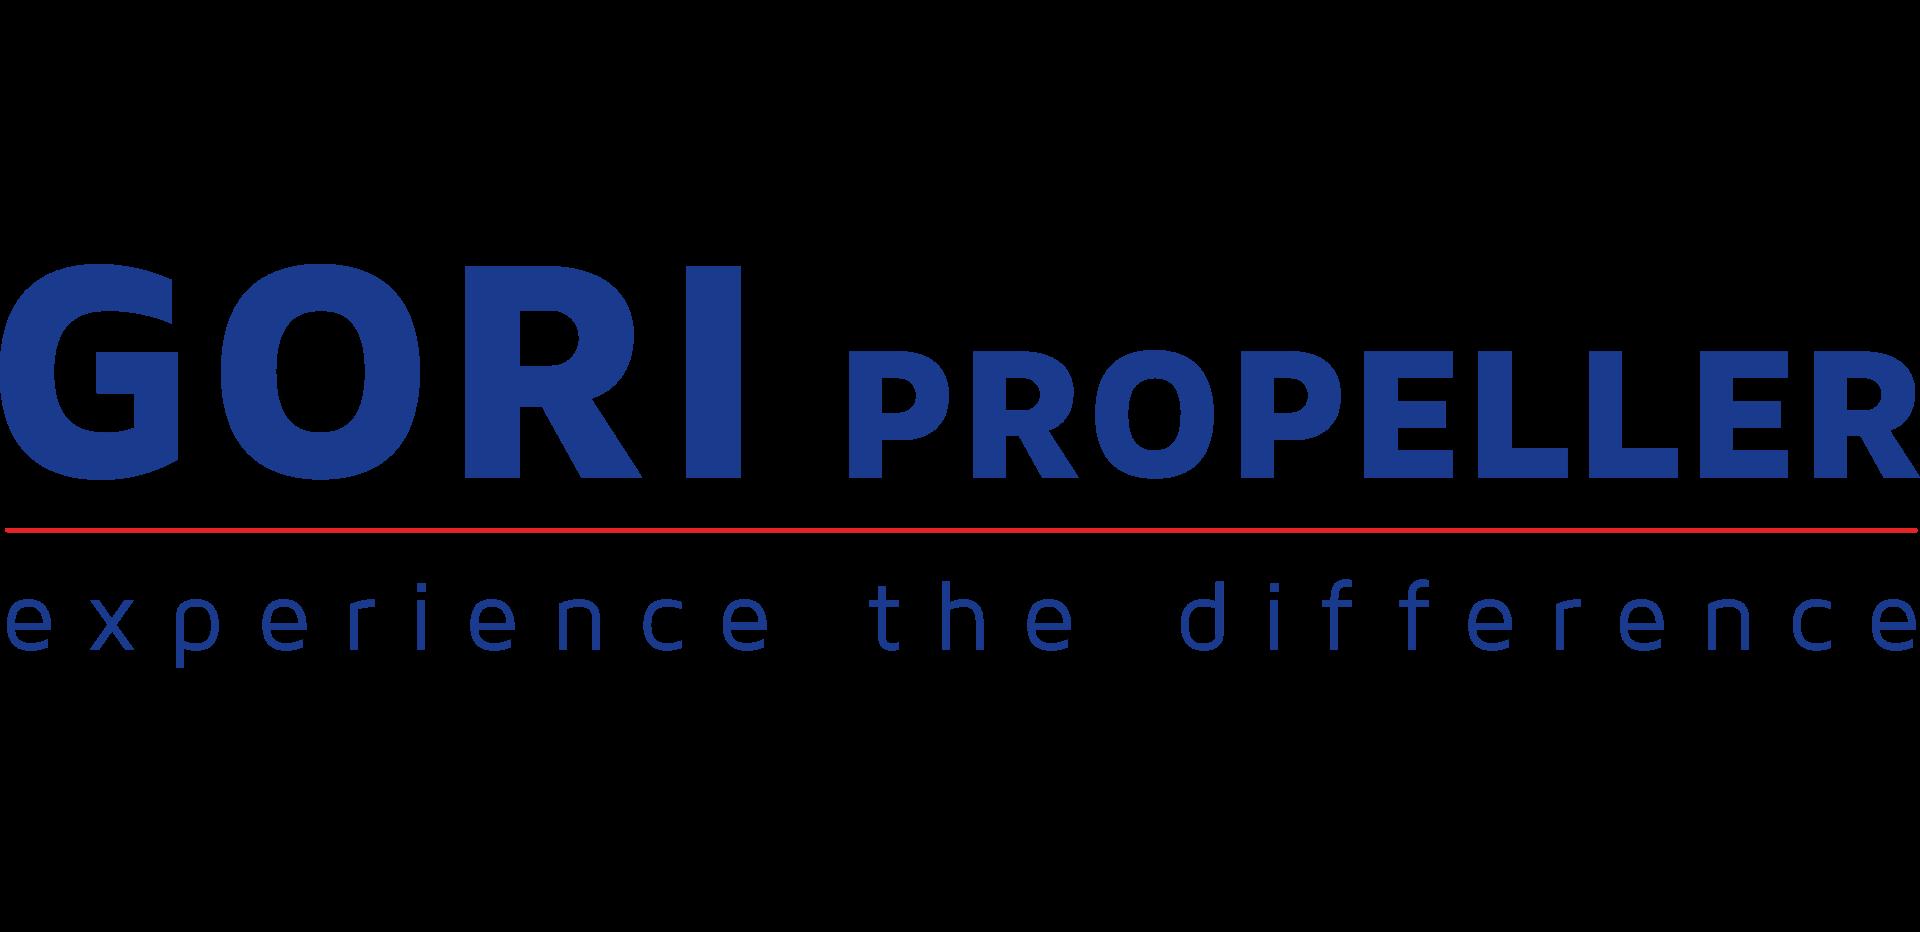 GORI Propellers